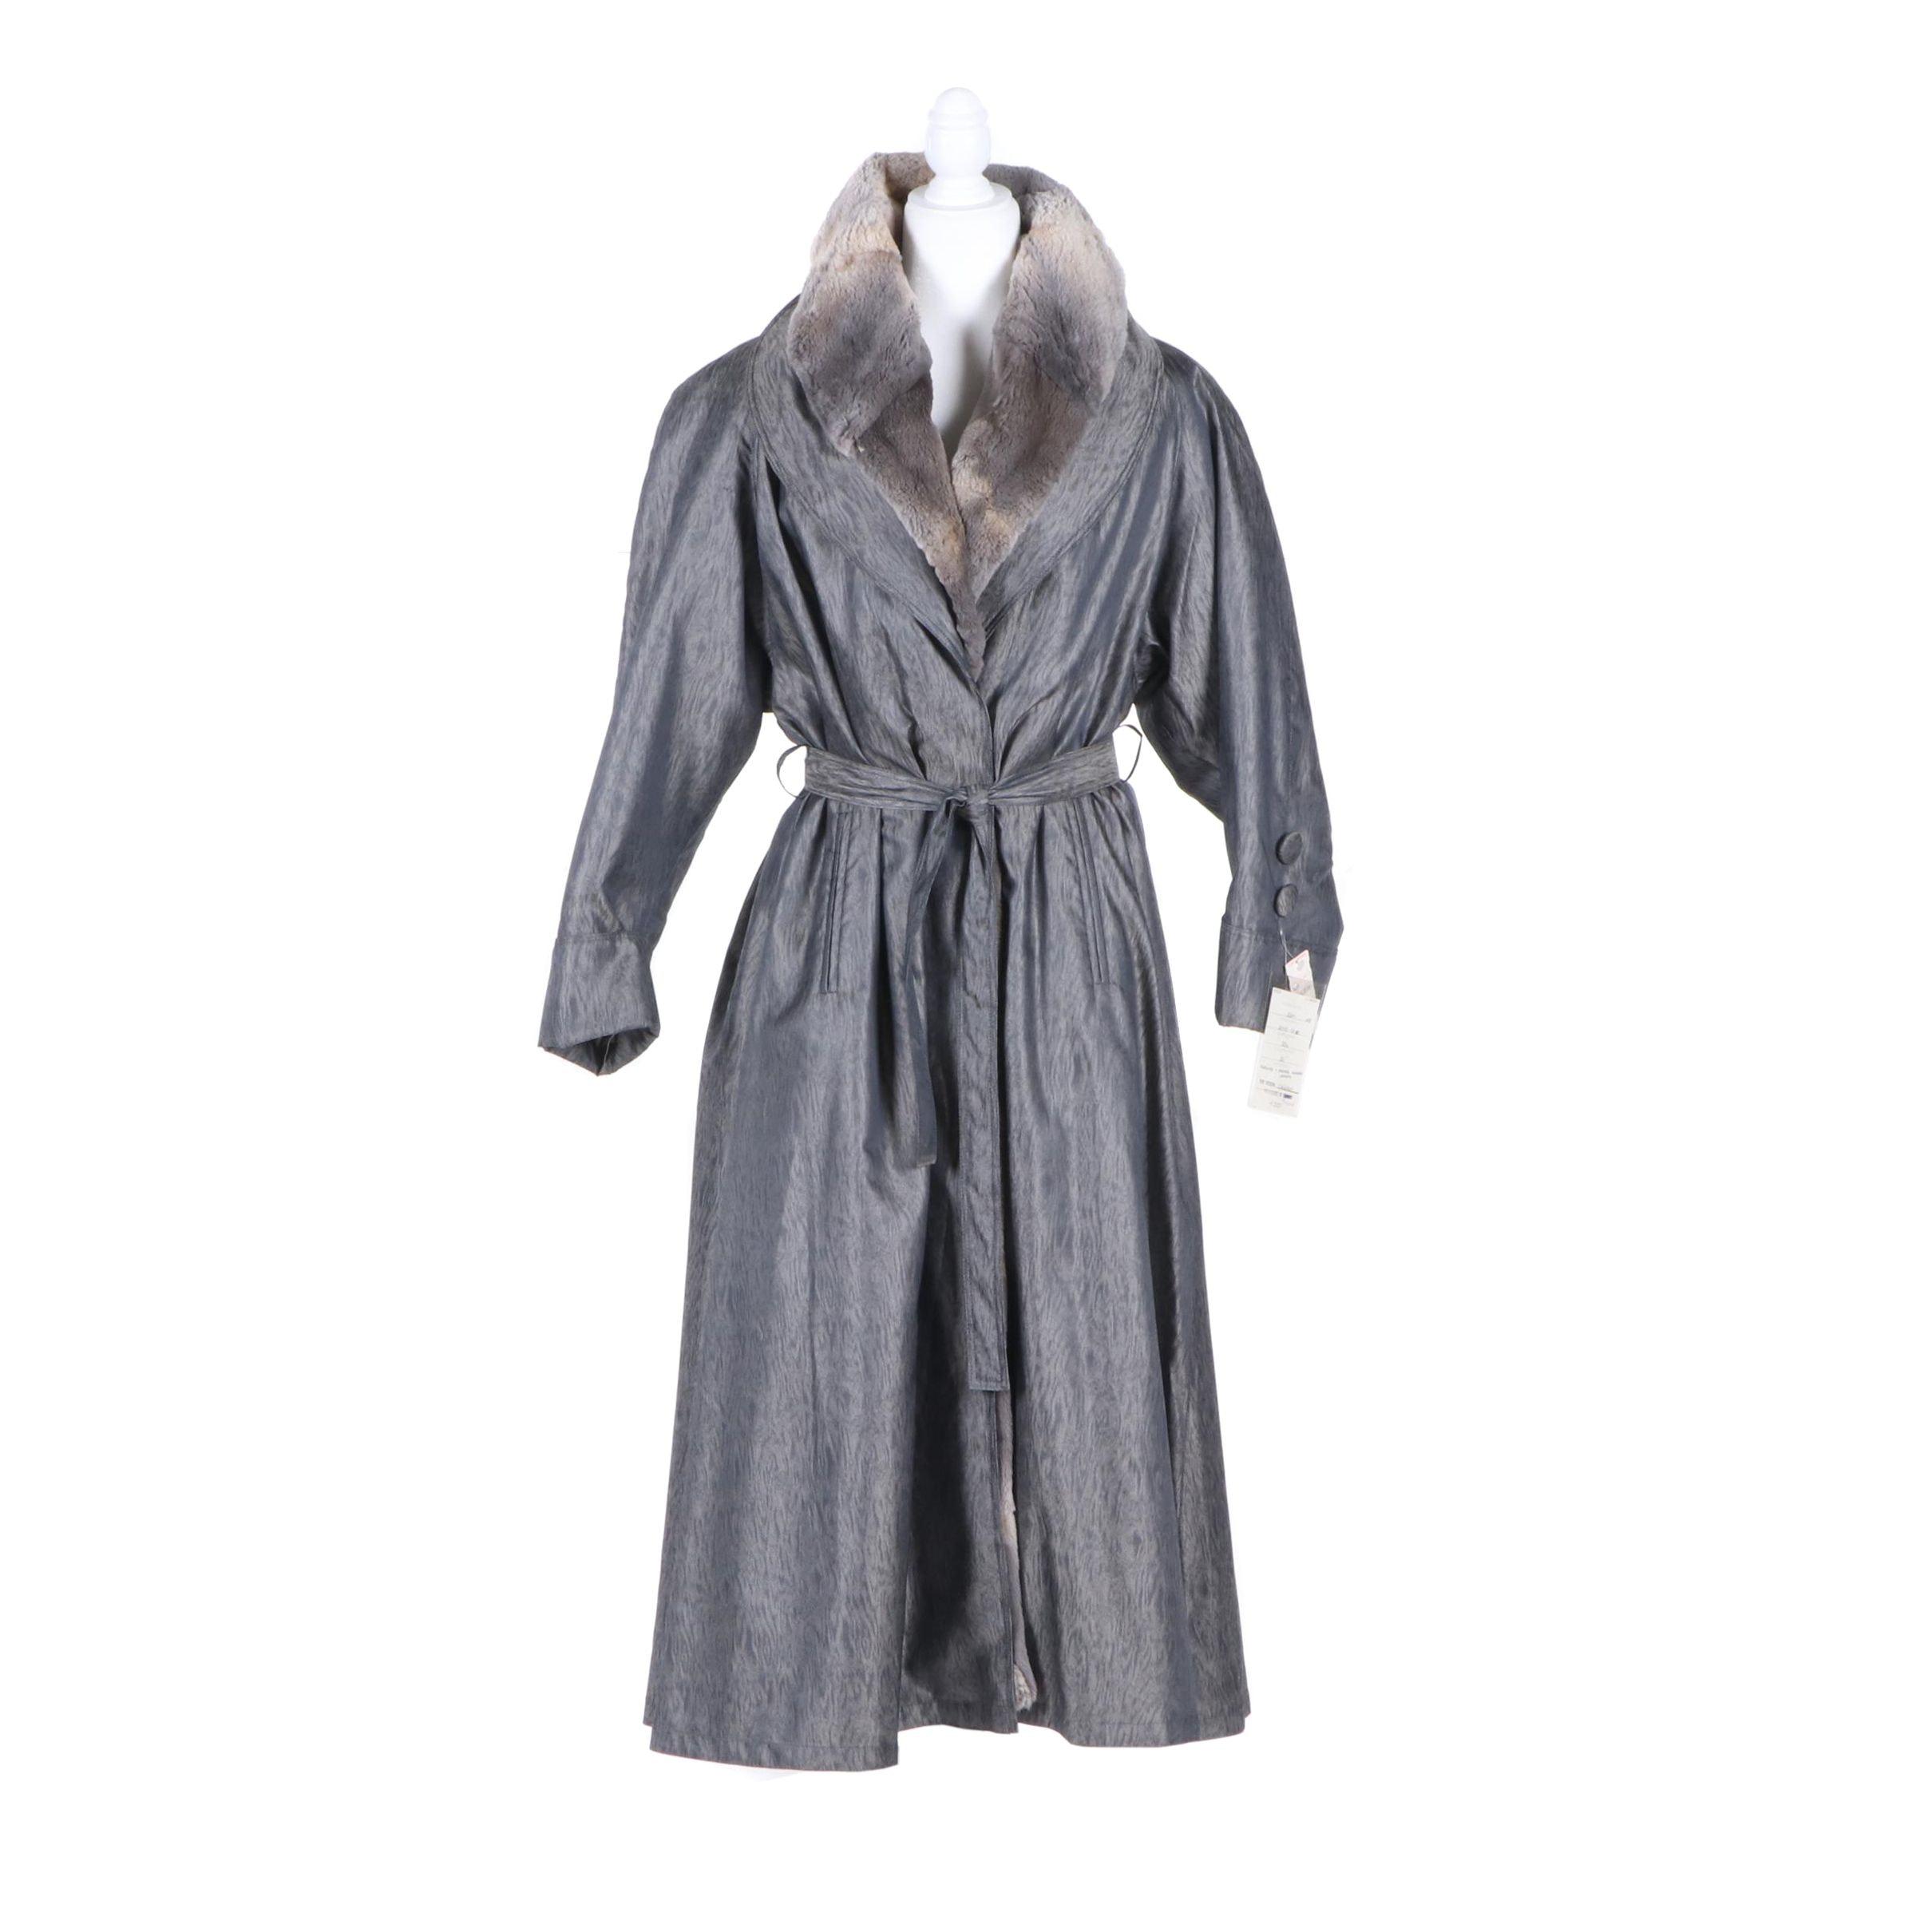 Women's McComber Sheared Muskrat Fur Lined Coat, Made in Finland